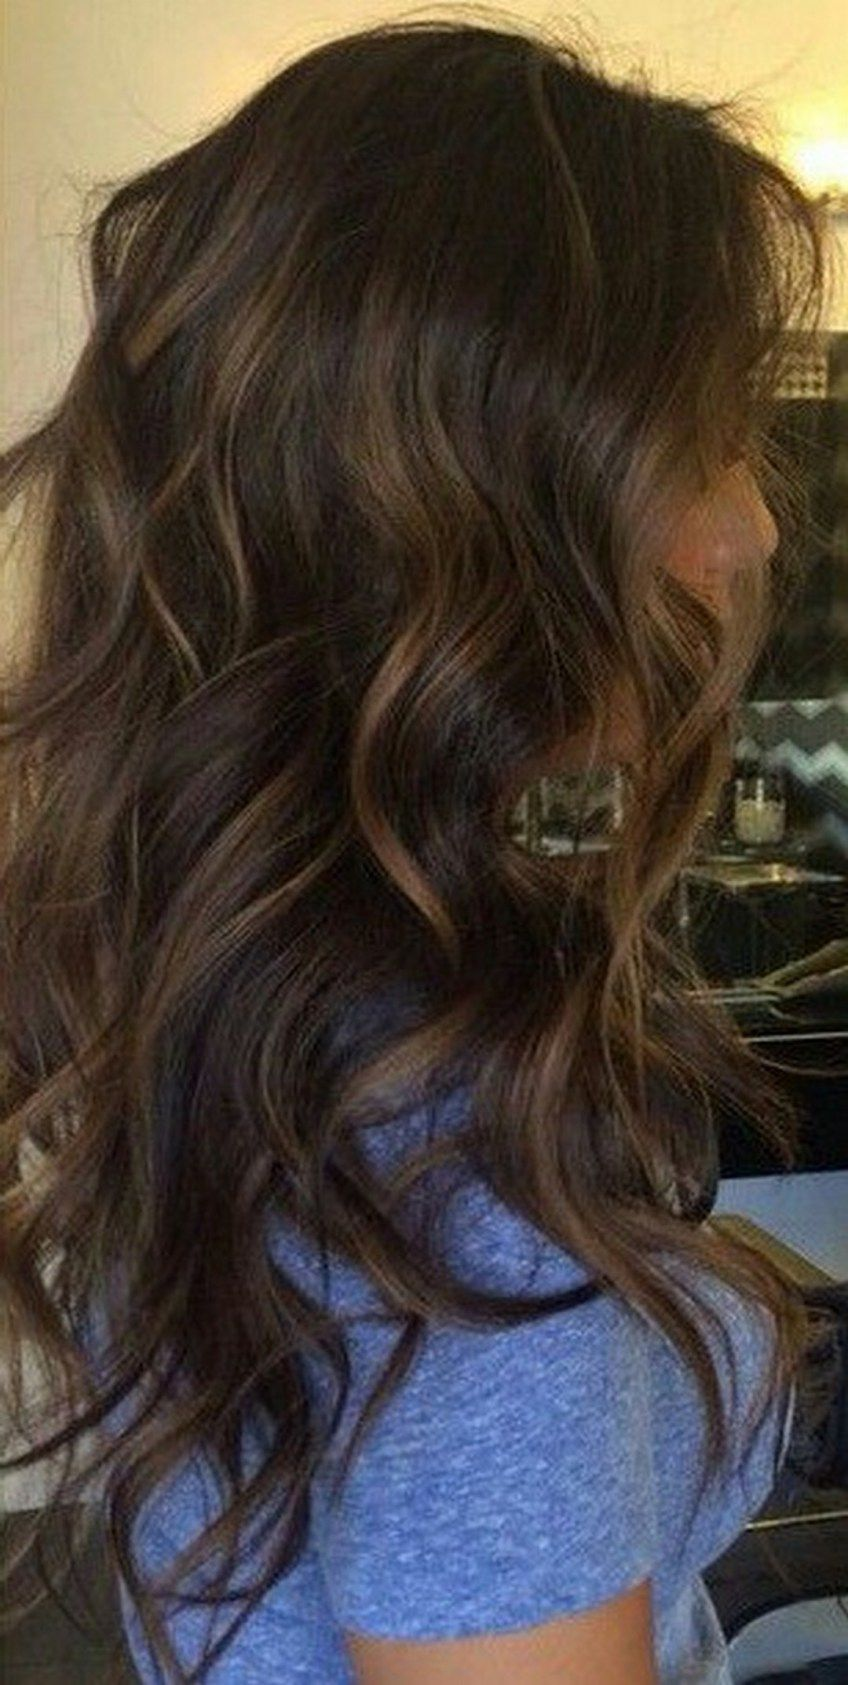 Burnette Hair Color Style Trends In 2017 21 Hair